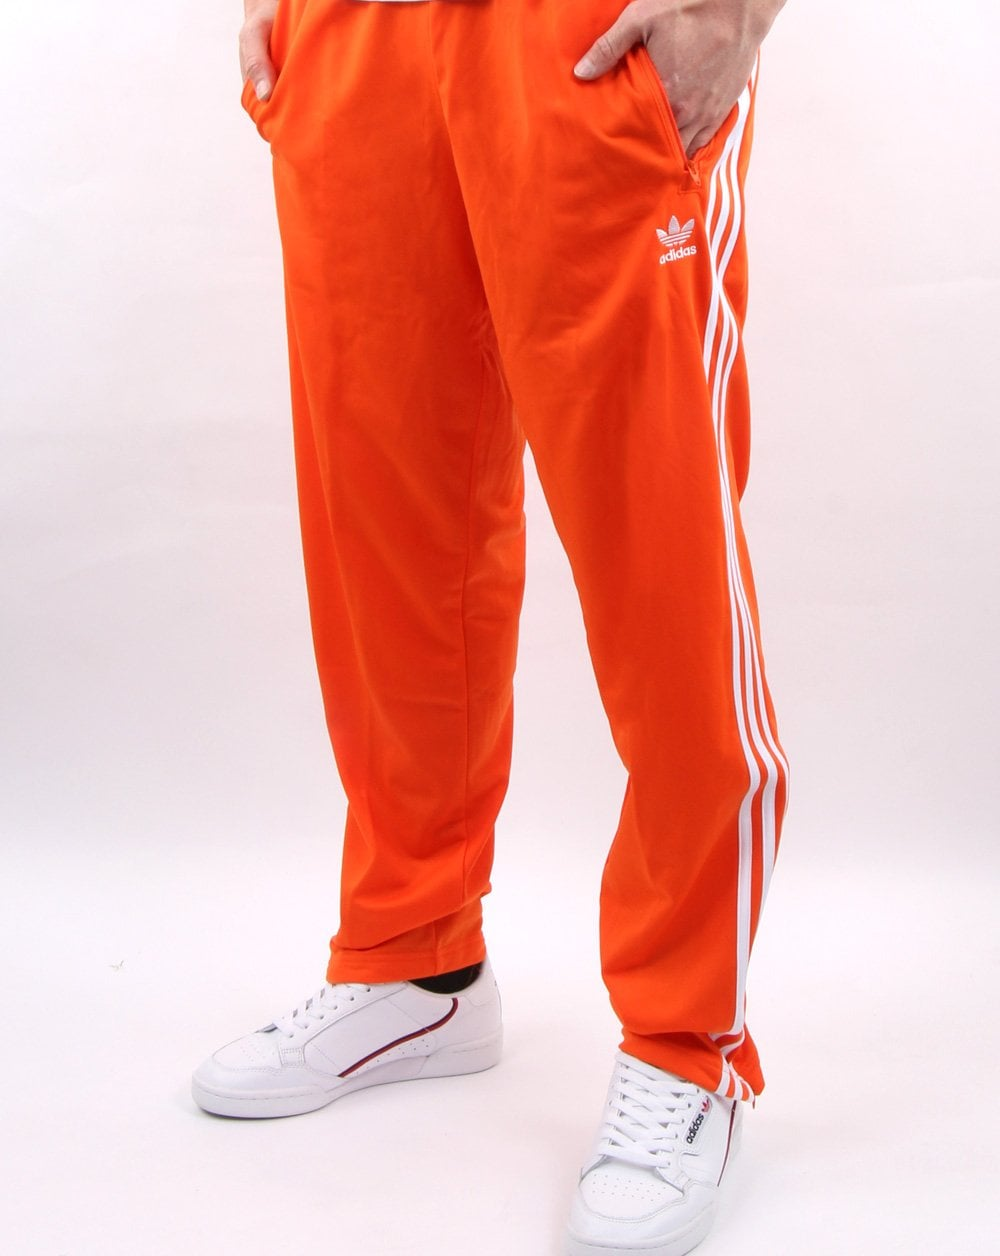 adidas Originals Firebird Track Pants | Size?